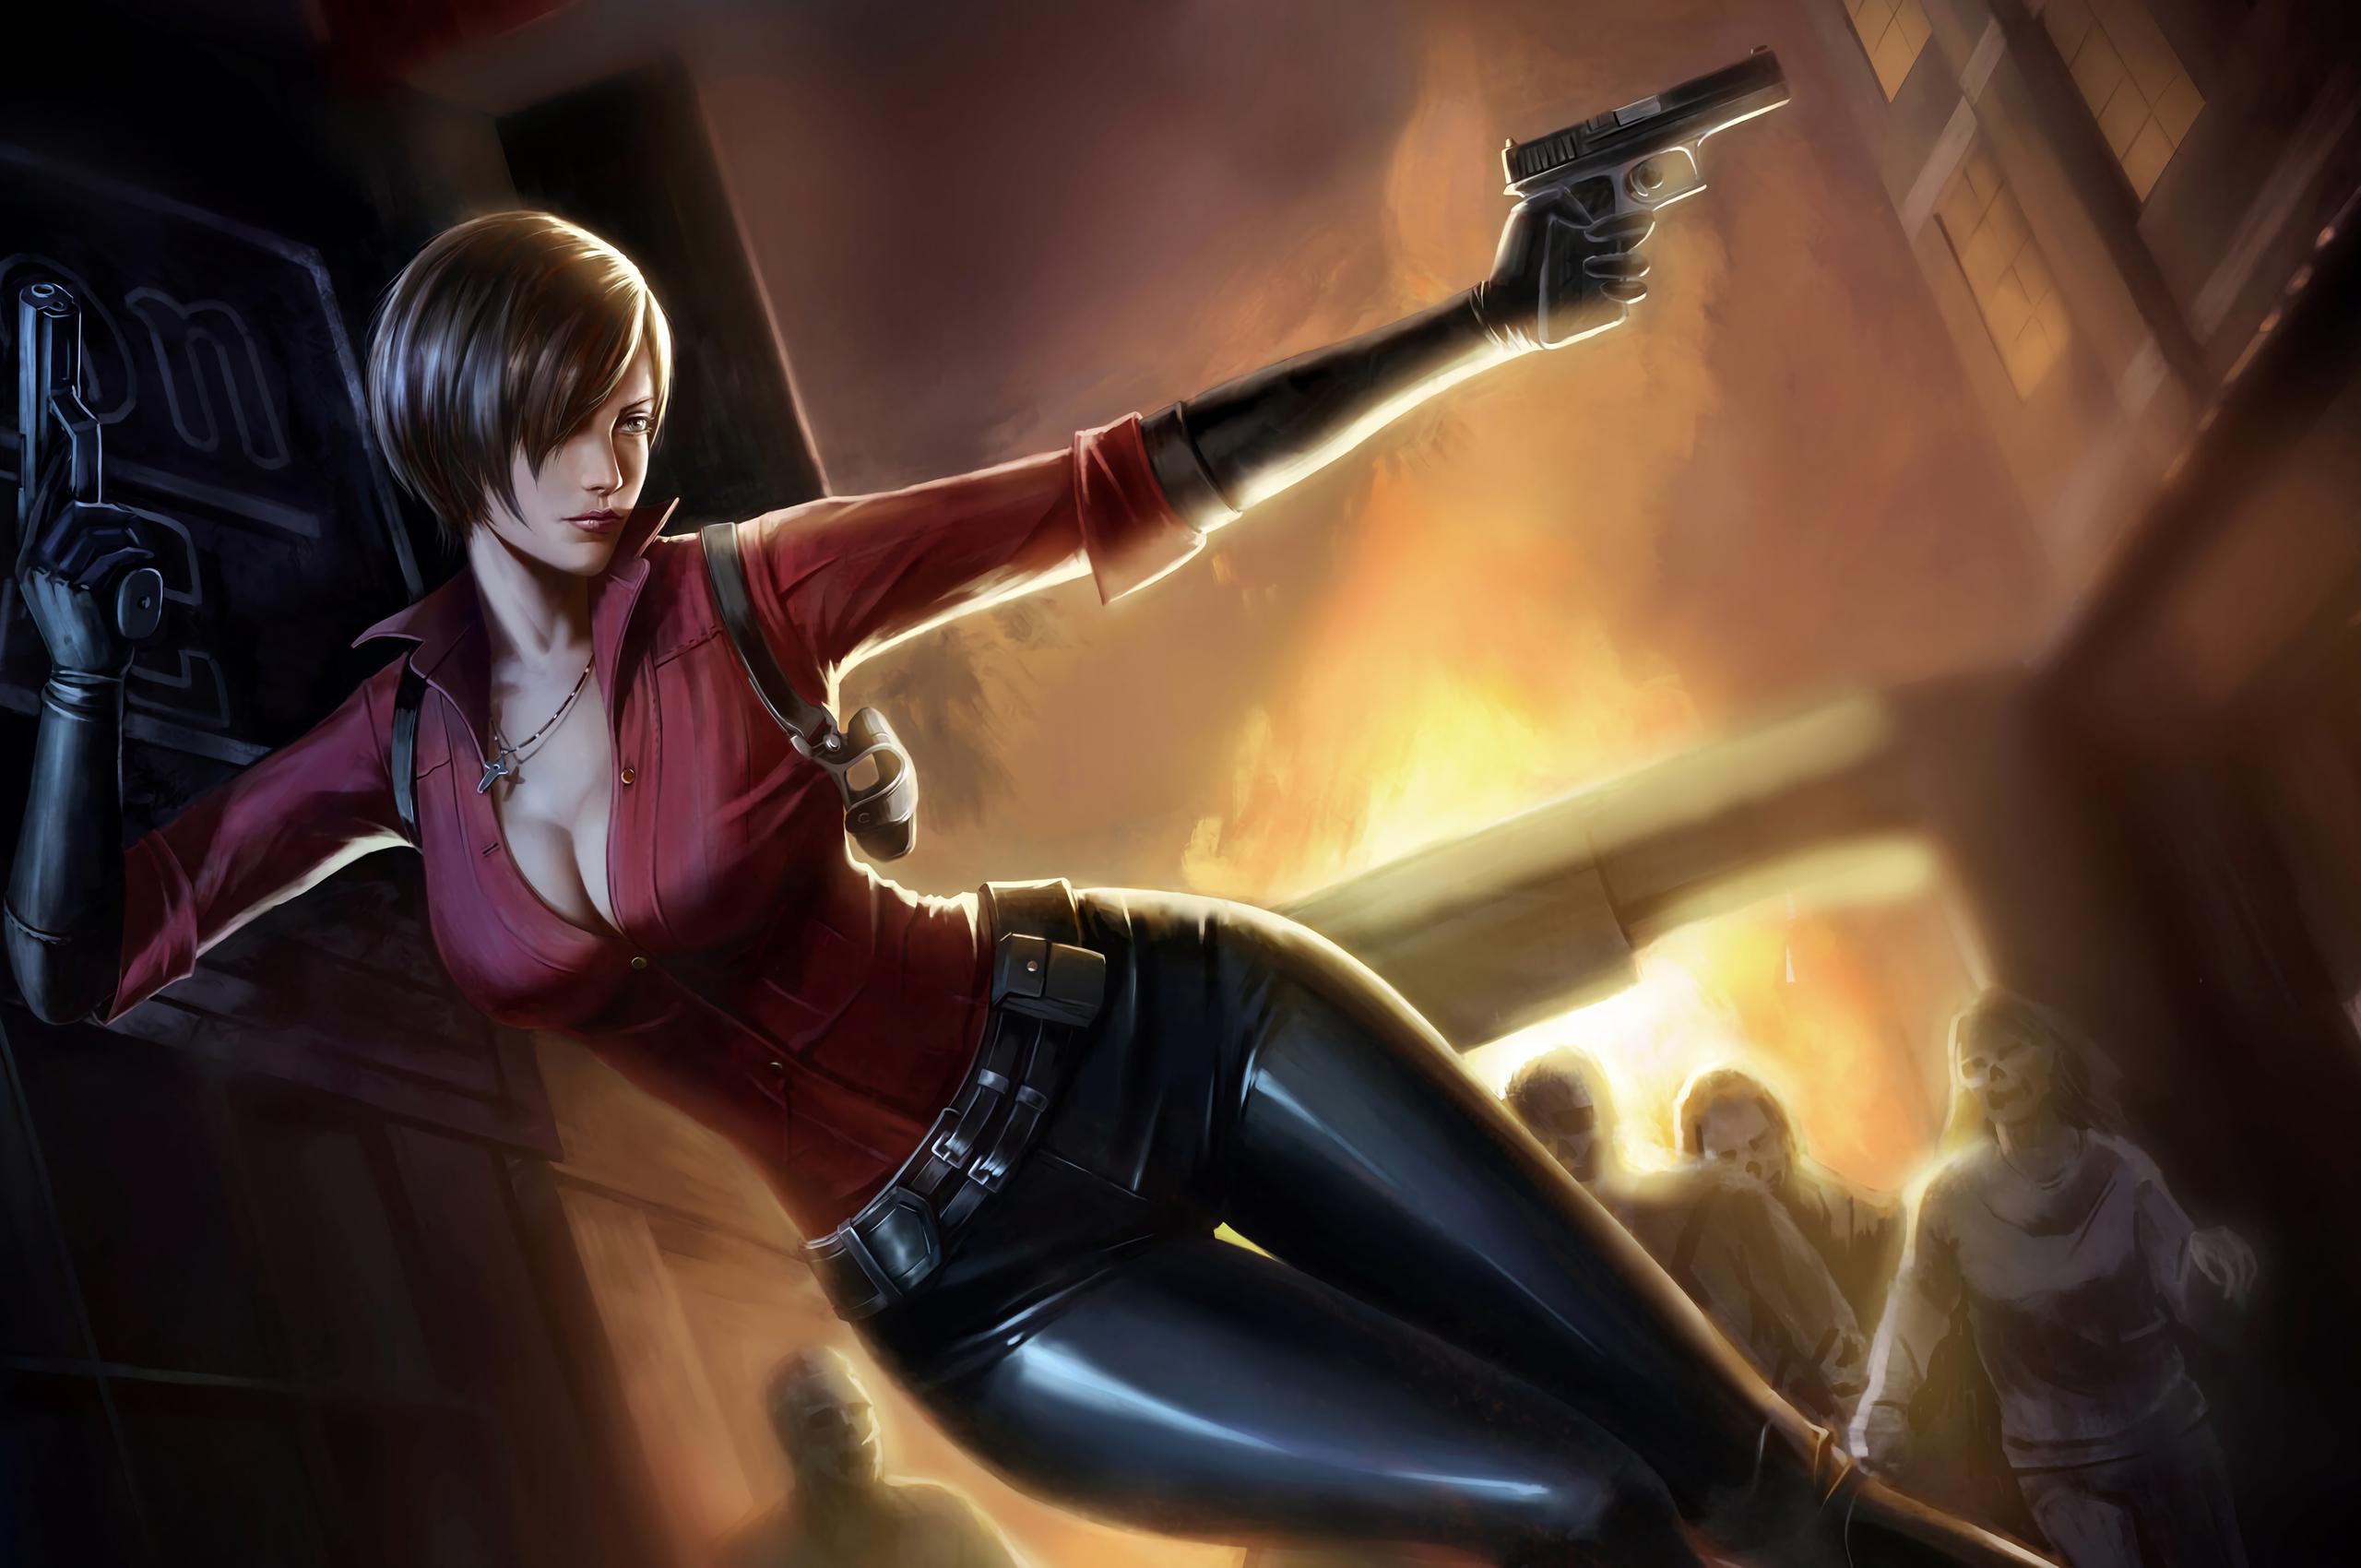 2560x1700 Ada Wong Resident Evil 2 4k Art Chromebook Pixel Hd 4k